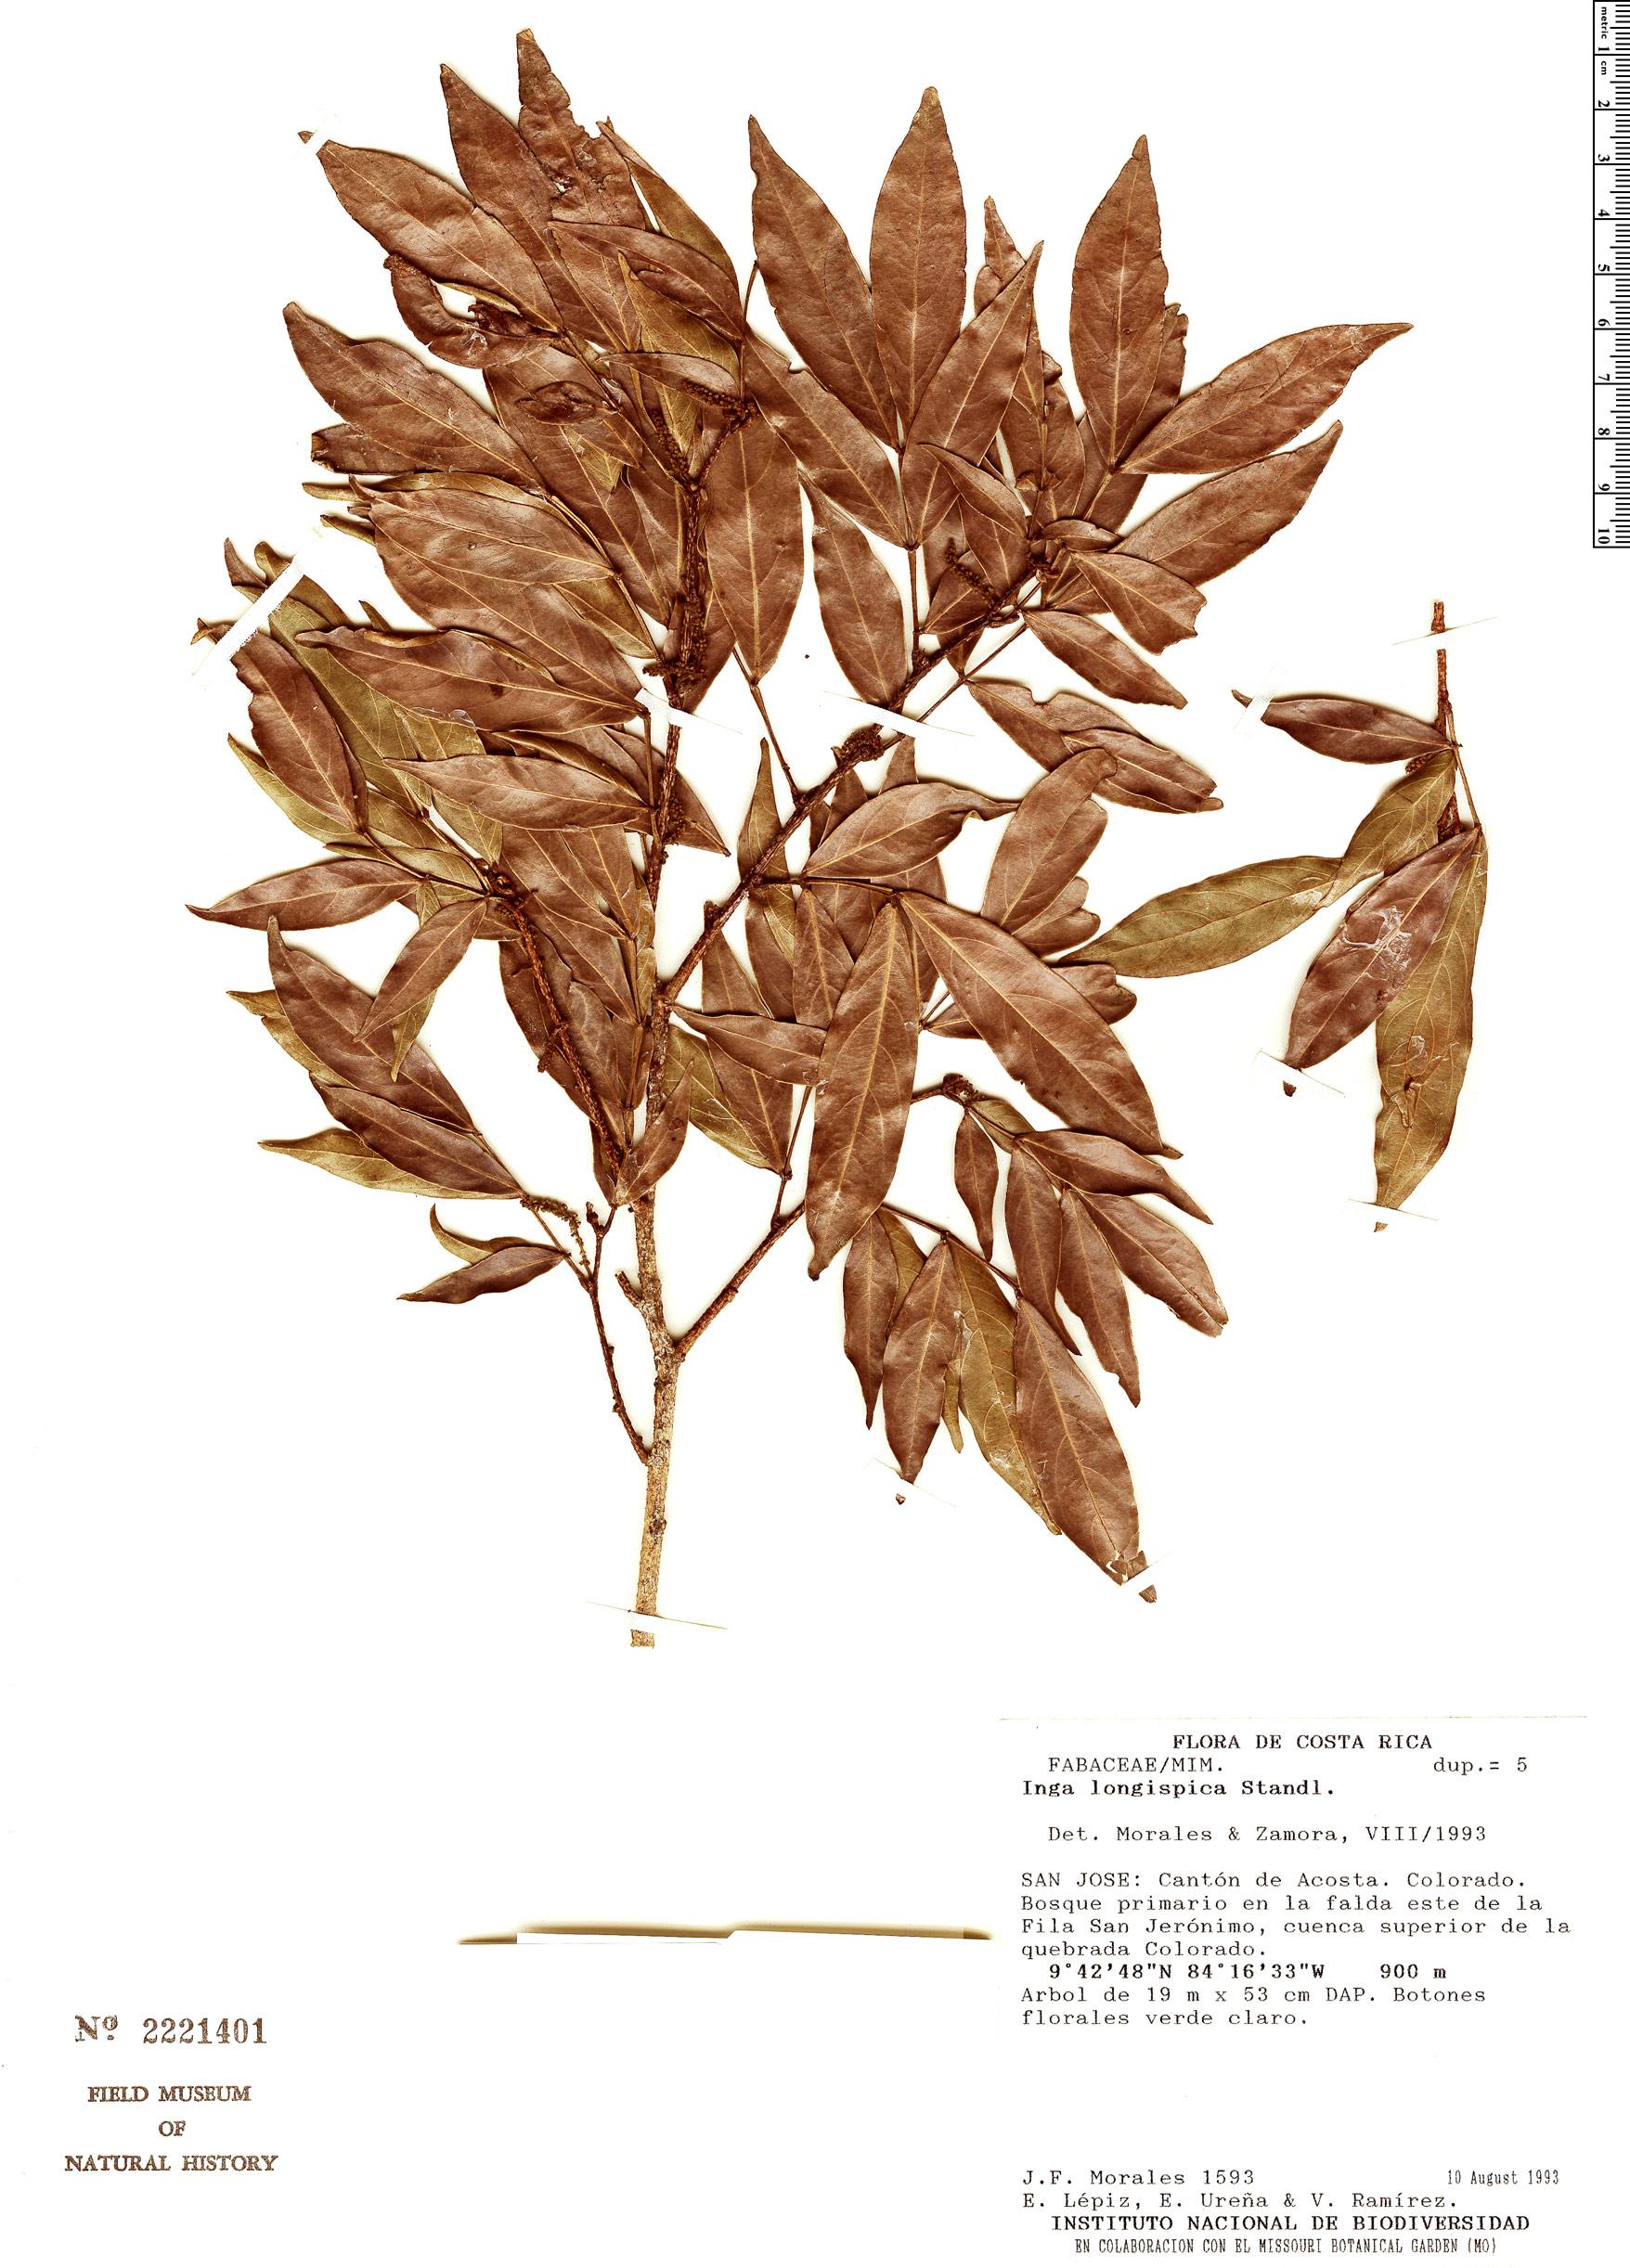 Specimen: Inga longispica